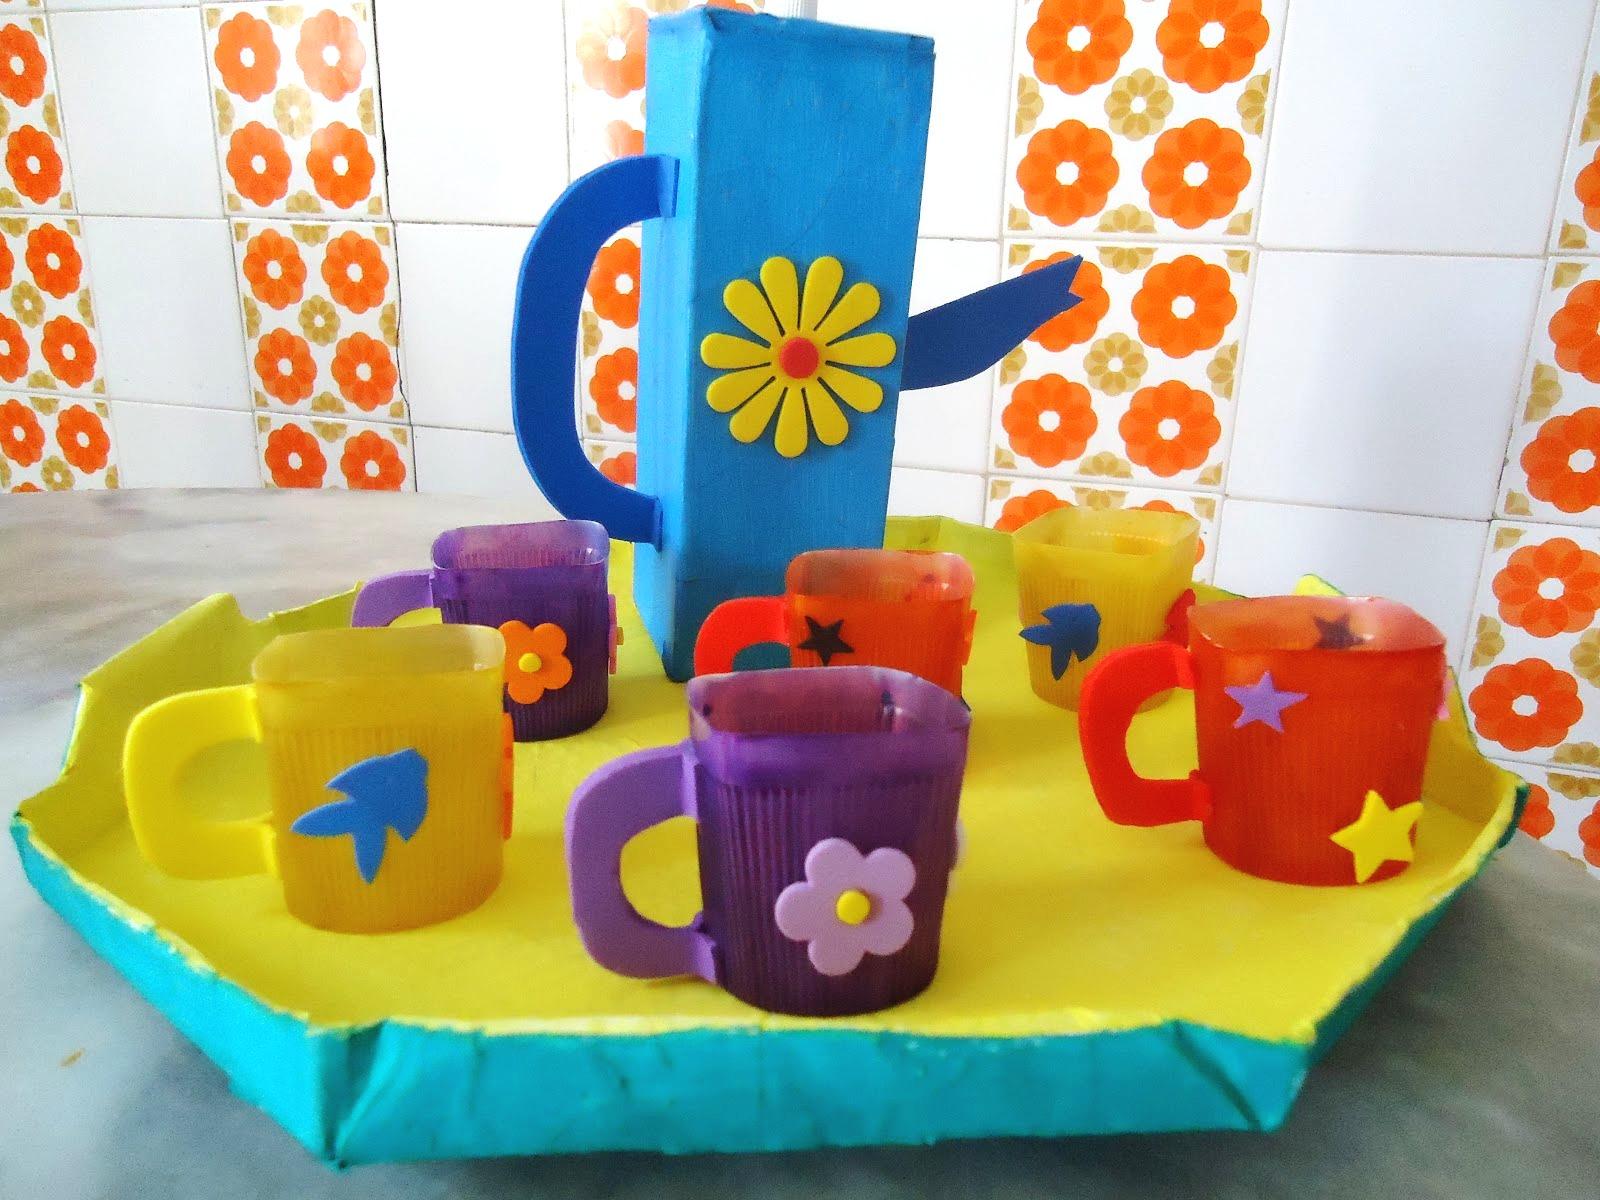 Feito Brinquedos De Material Reciclado